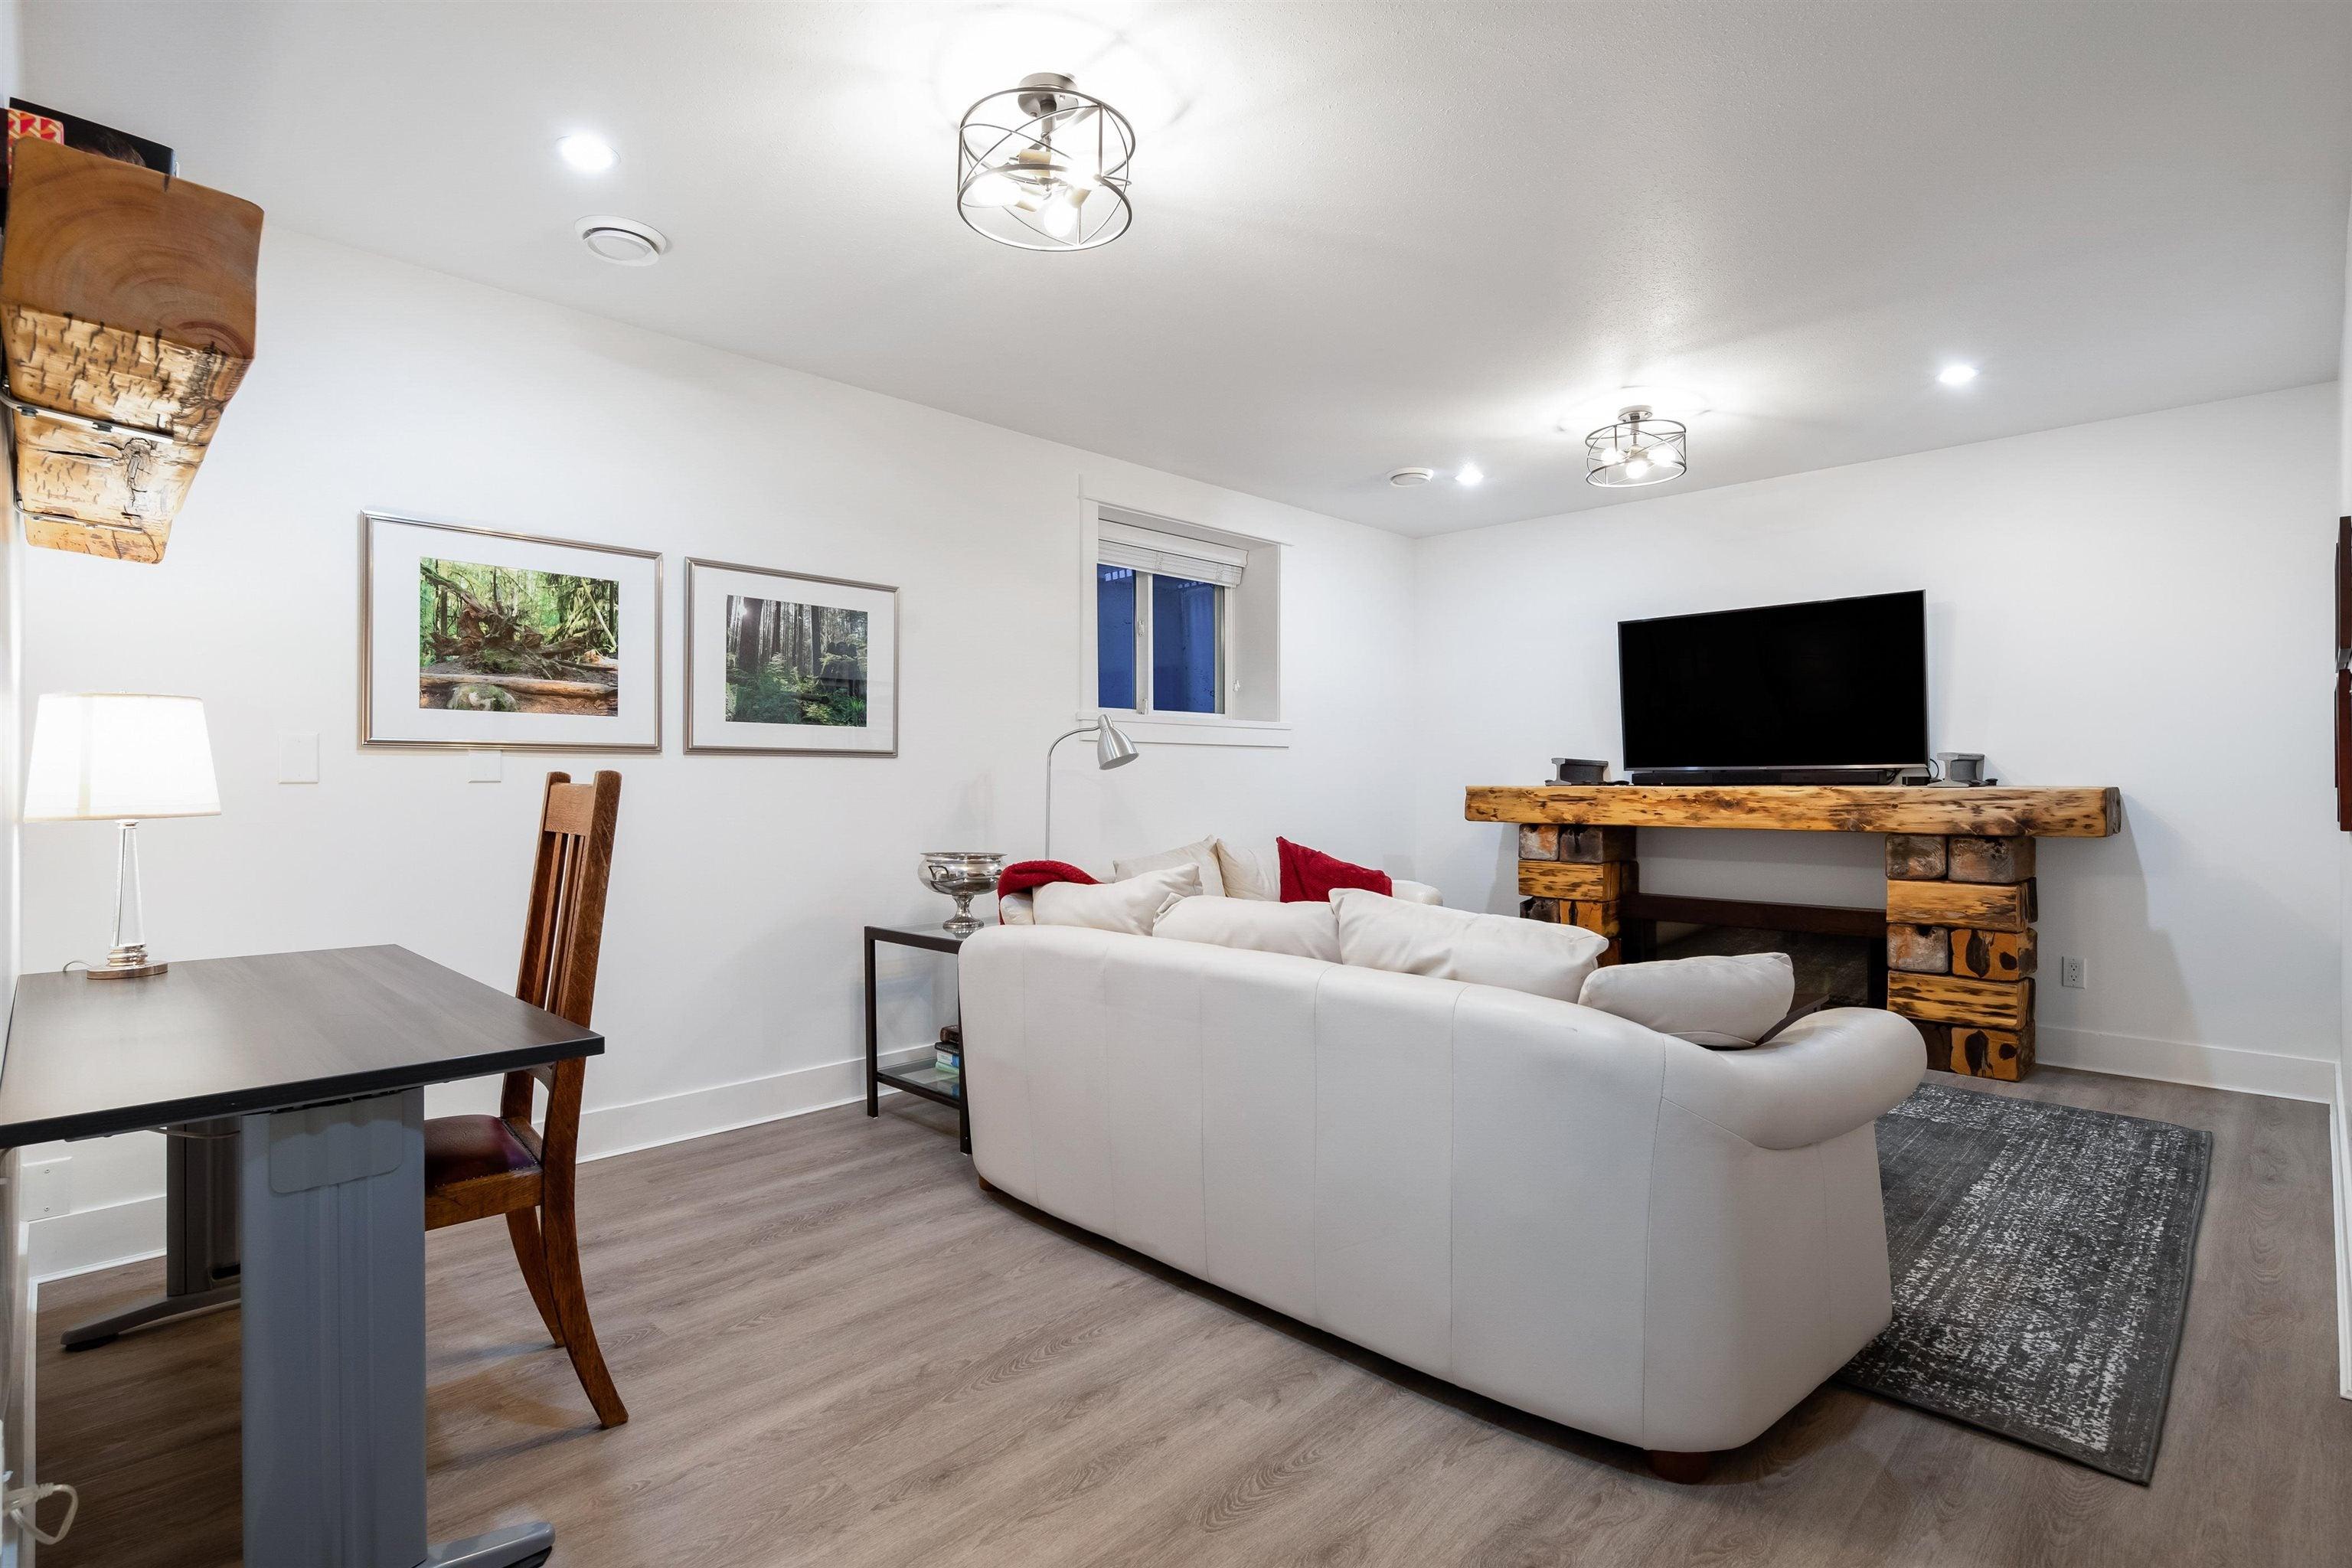 2258 WINDRIDGE DRIVE - Seymour NV House/Single Family for sale, 5 Bedrooms (R2617156) - #28